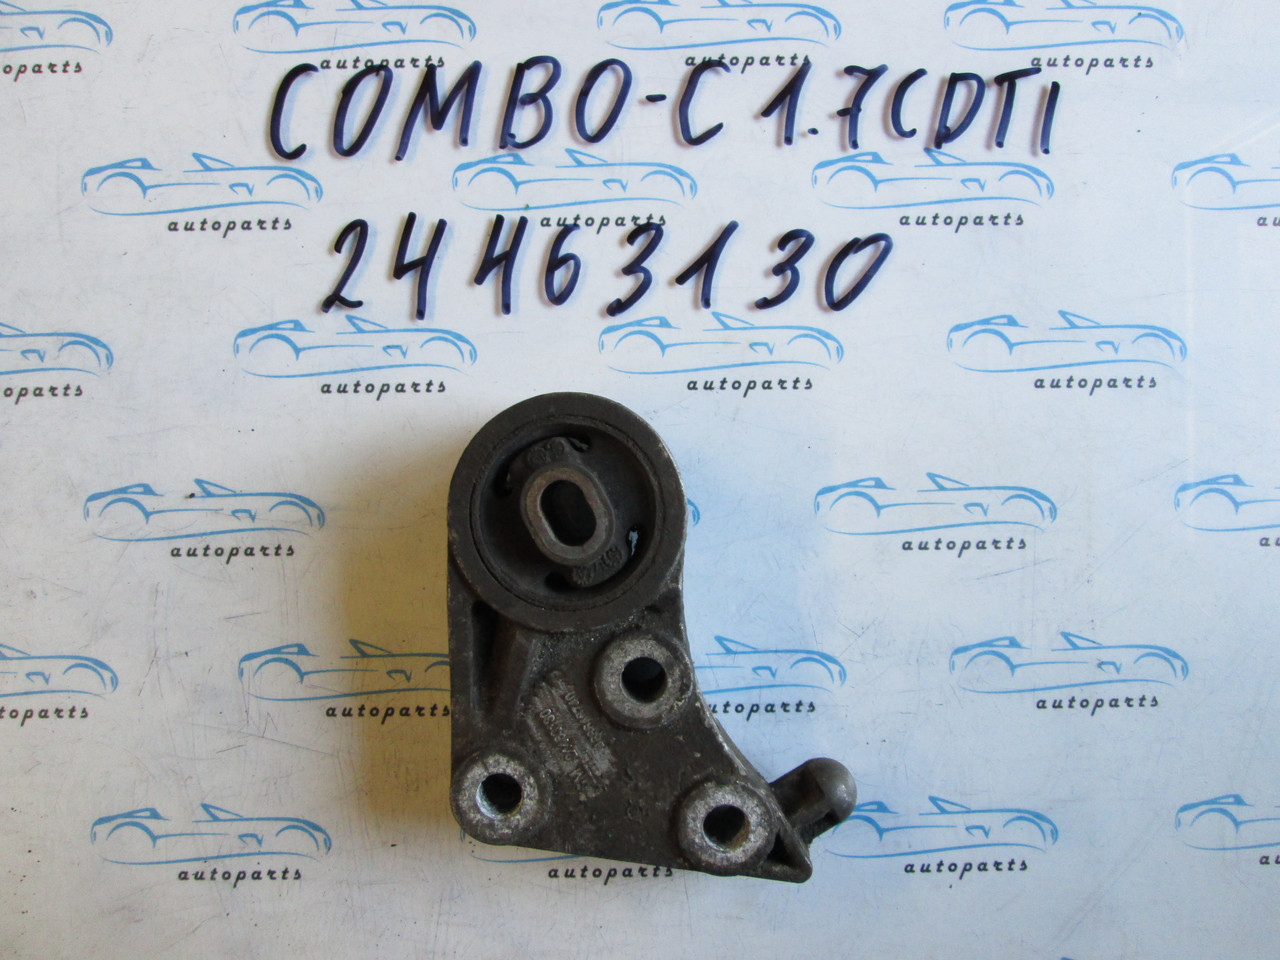 Подушка двигателя Комбо С, Combo c 1.7CDTI 24463130